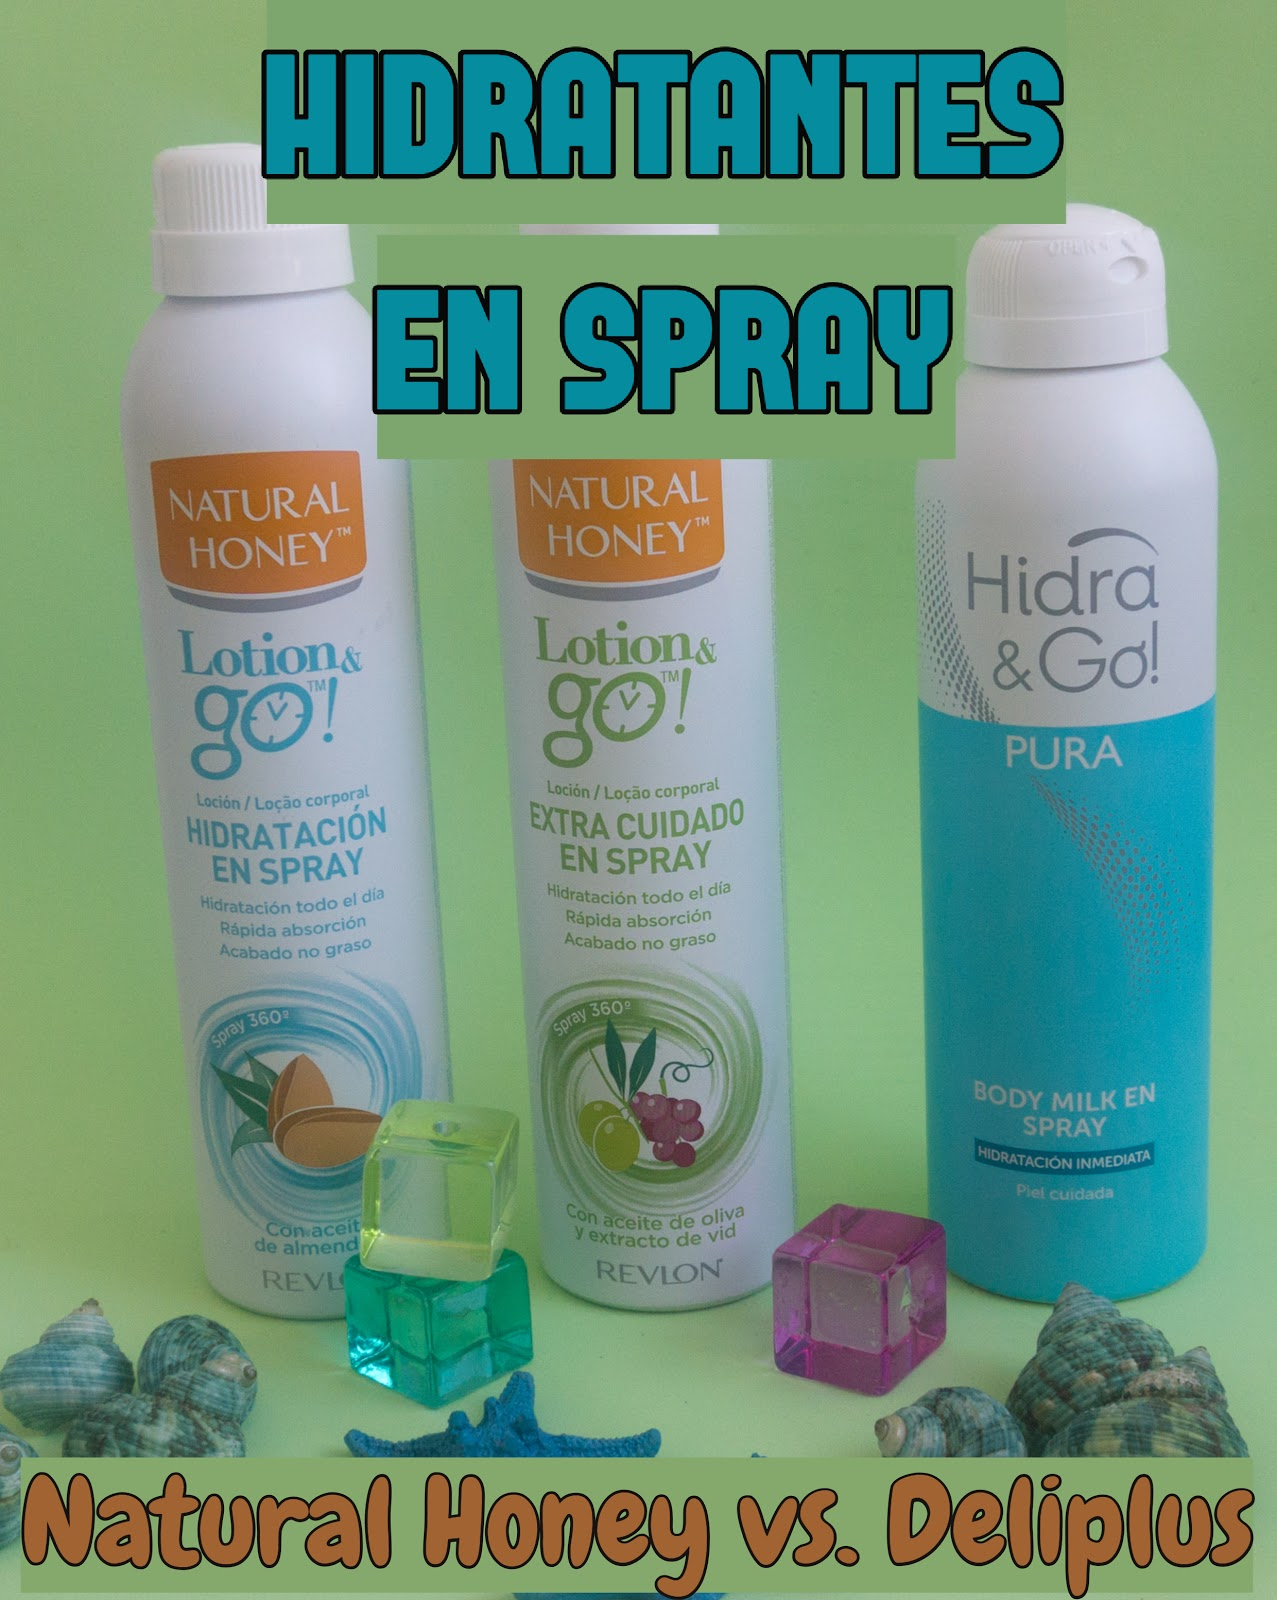 e9495468b Hidratantes corporales en spray: ¿Merecen la pena? Comparativa Natural  Honey vs. Deliplus